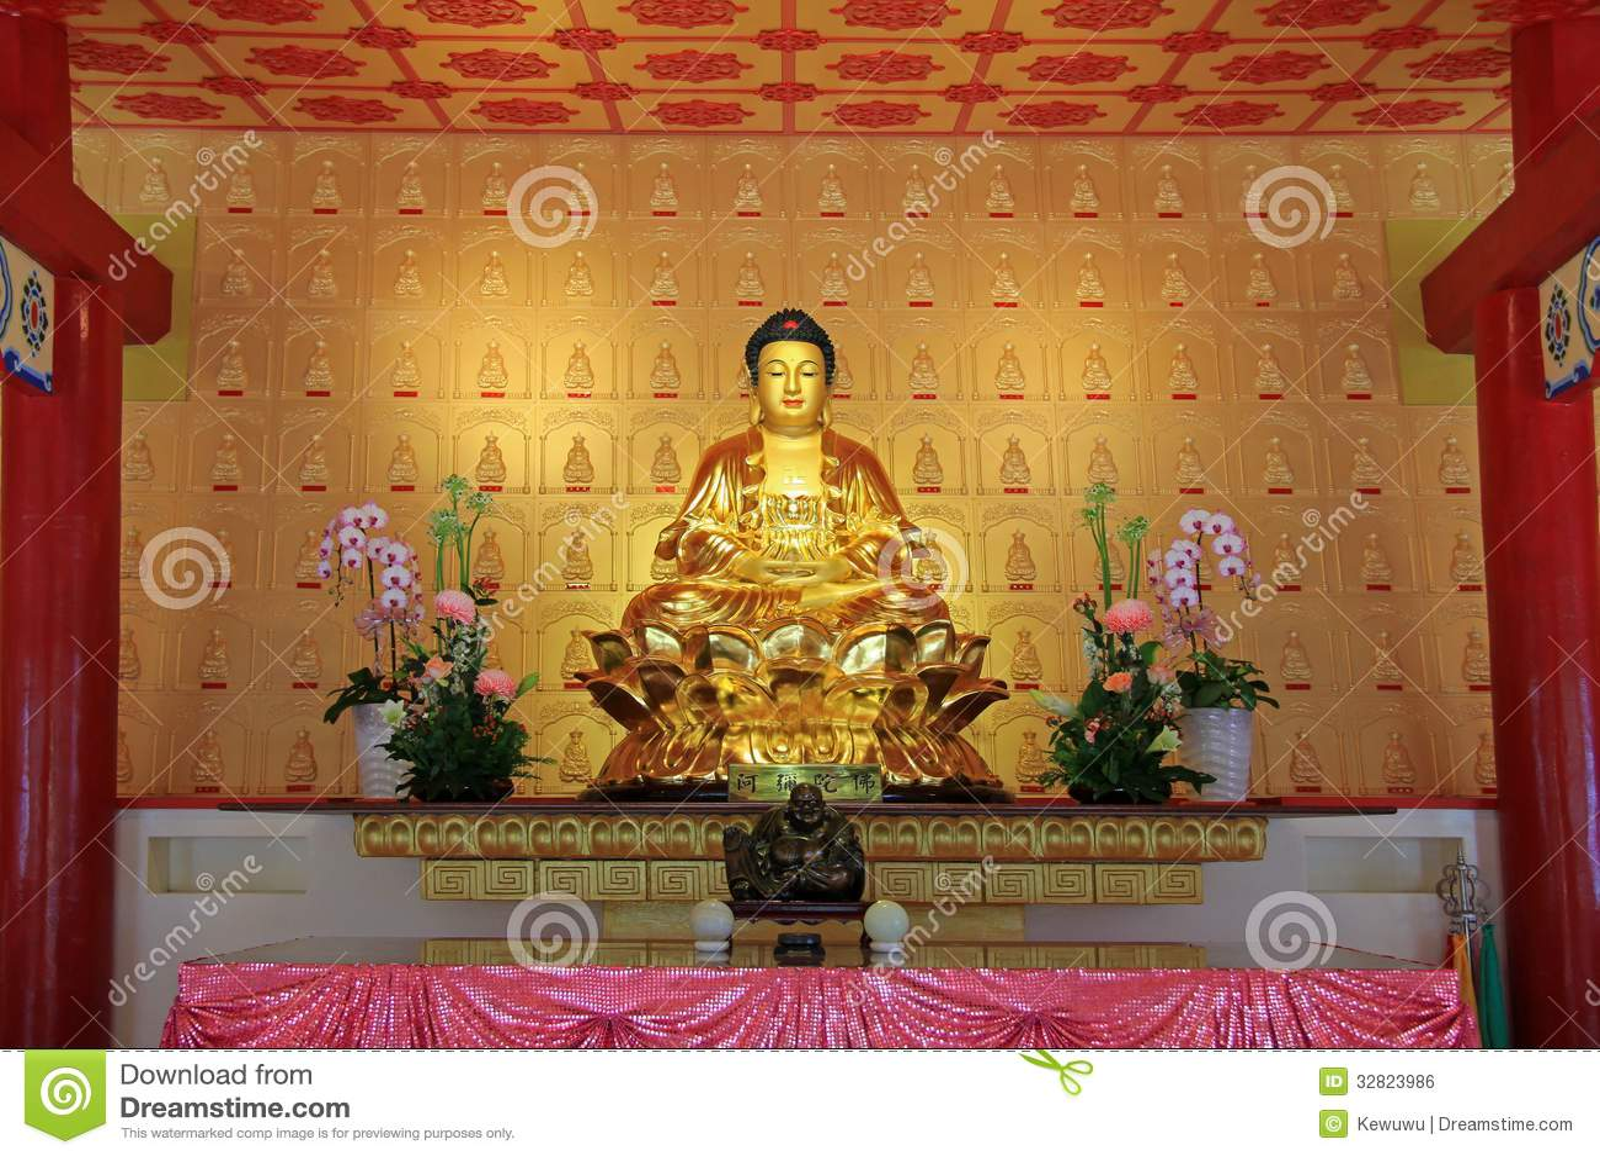 Buddha statue sitting on lotus flower stock photo image of scenery buddha statue sitting on lotus flower izmirmasajfo